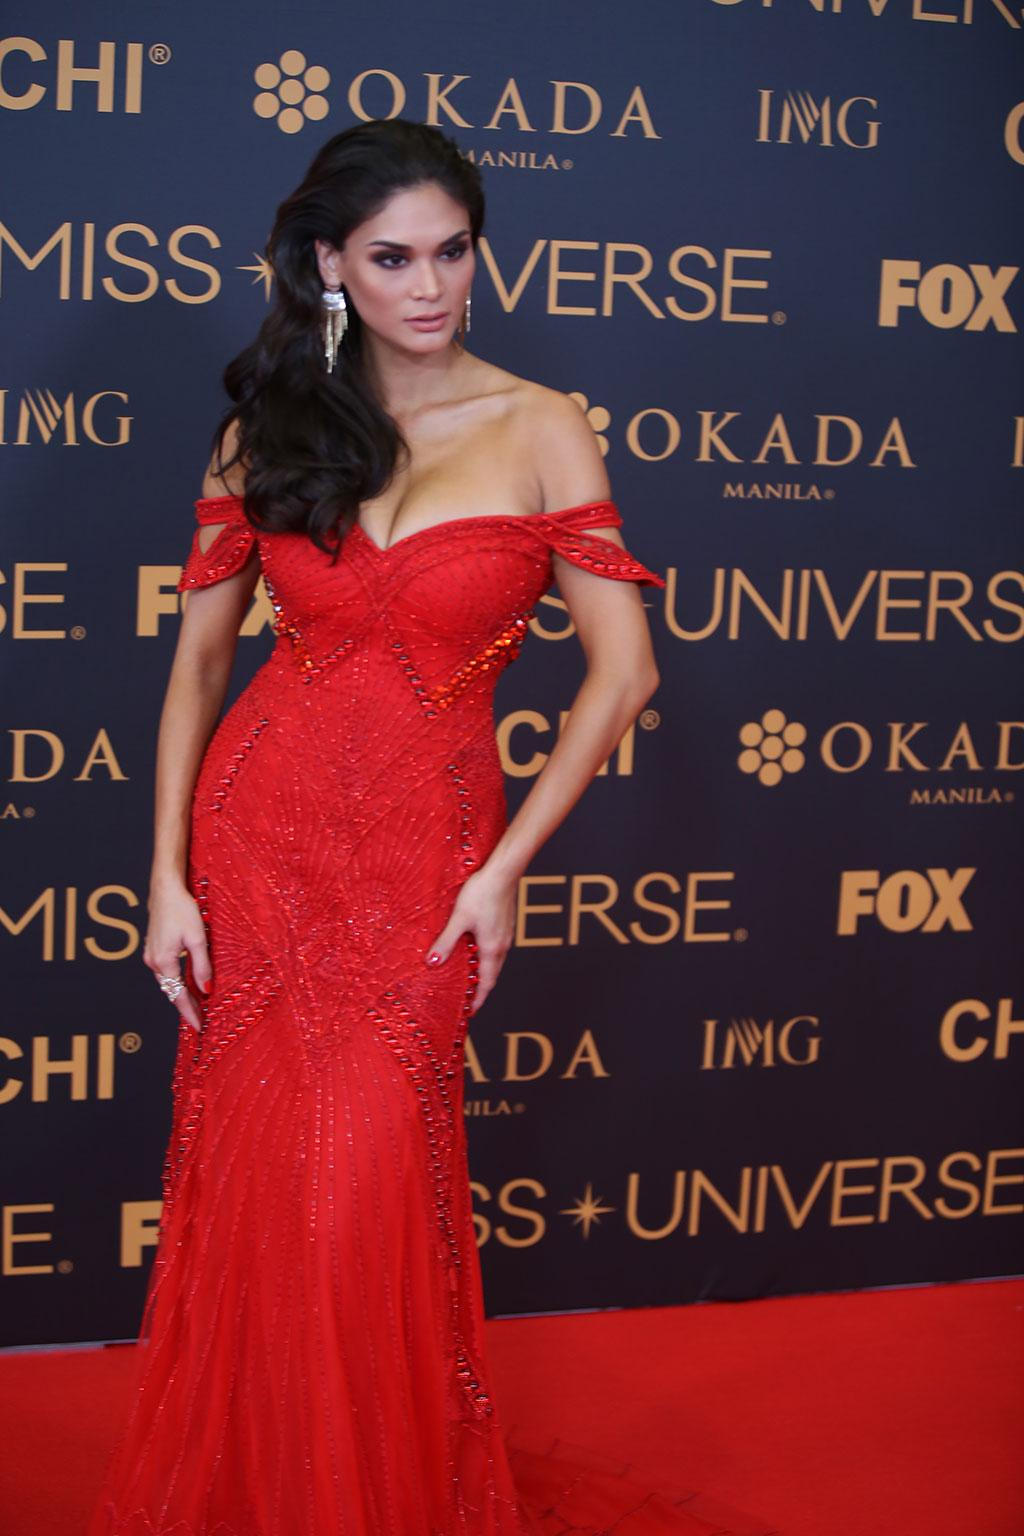 Miss Universe 2017 >> Pia Wurtzbach walks final red carpet as Miss Universe | Photos | GMA News Online